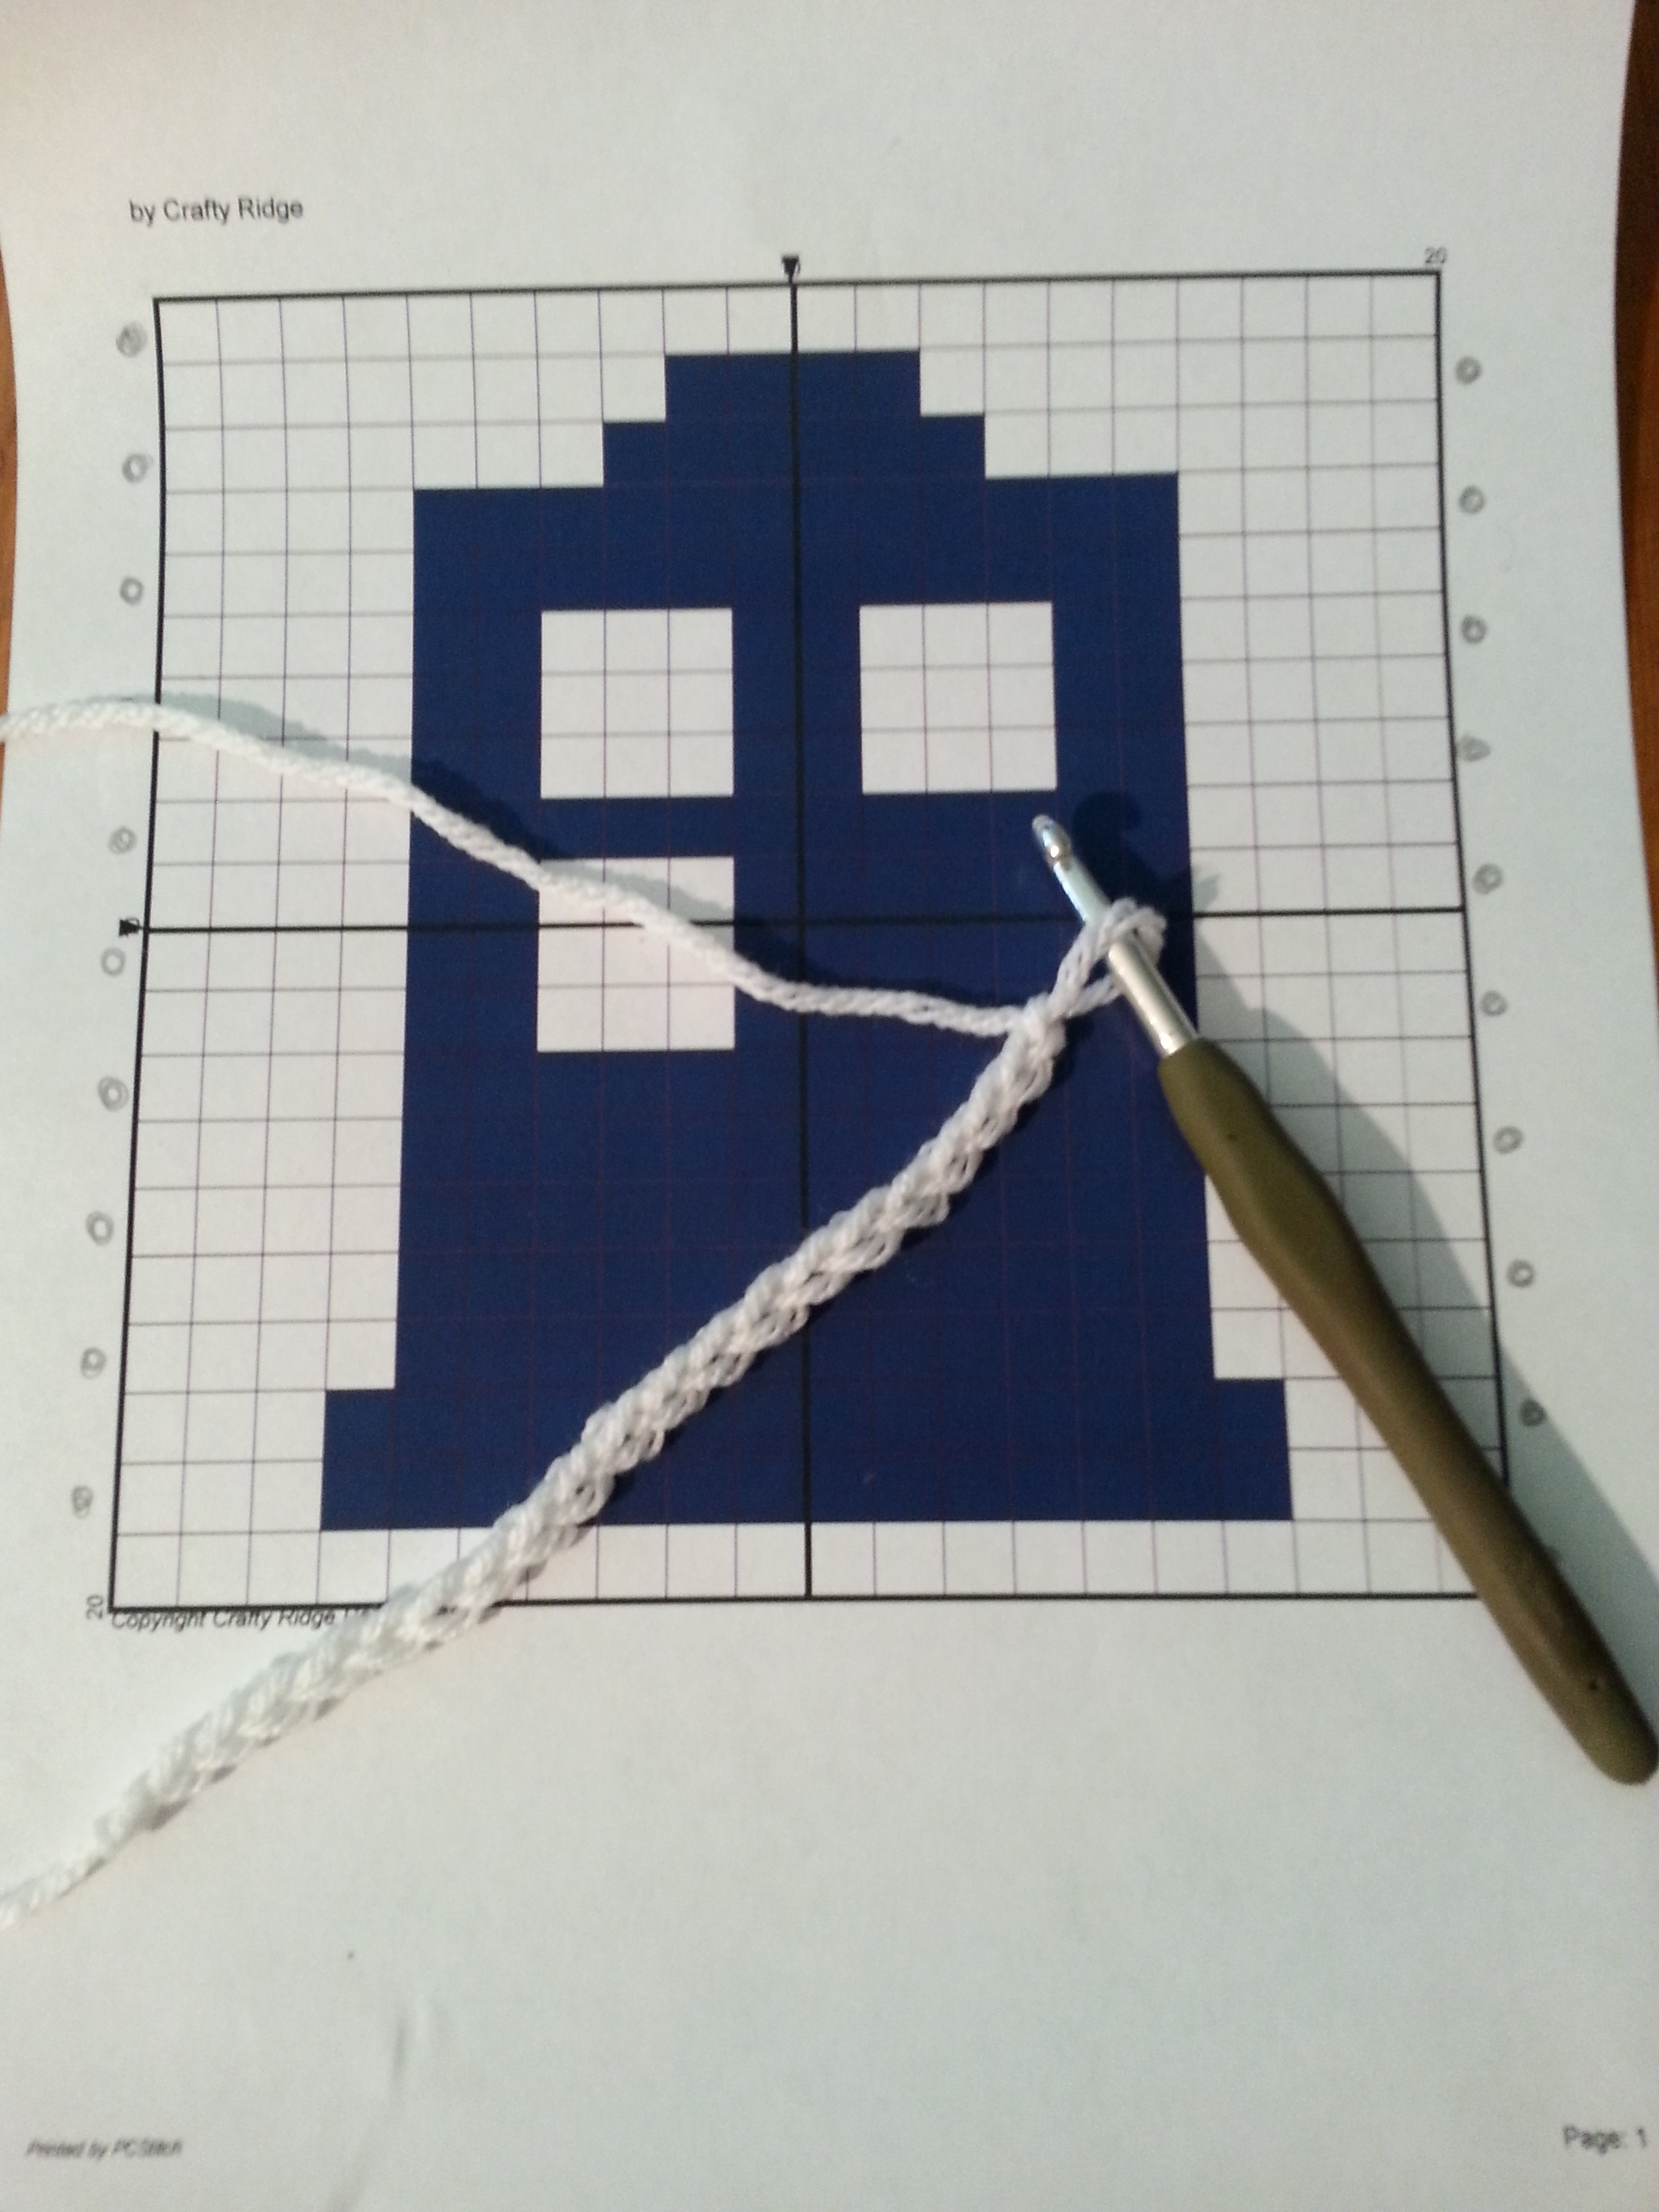 How To Crochet A Graph Crafty Ridge Designs